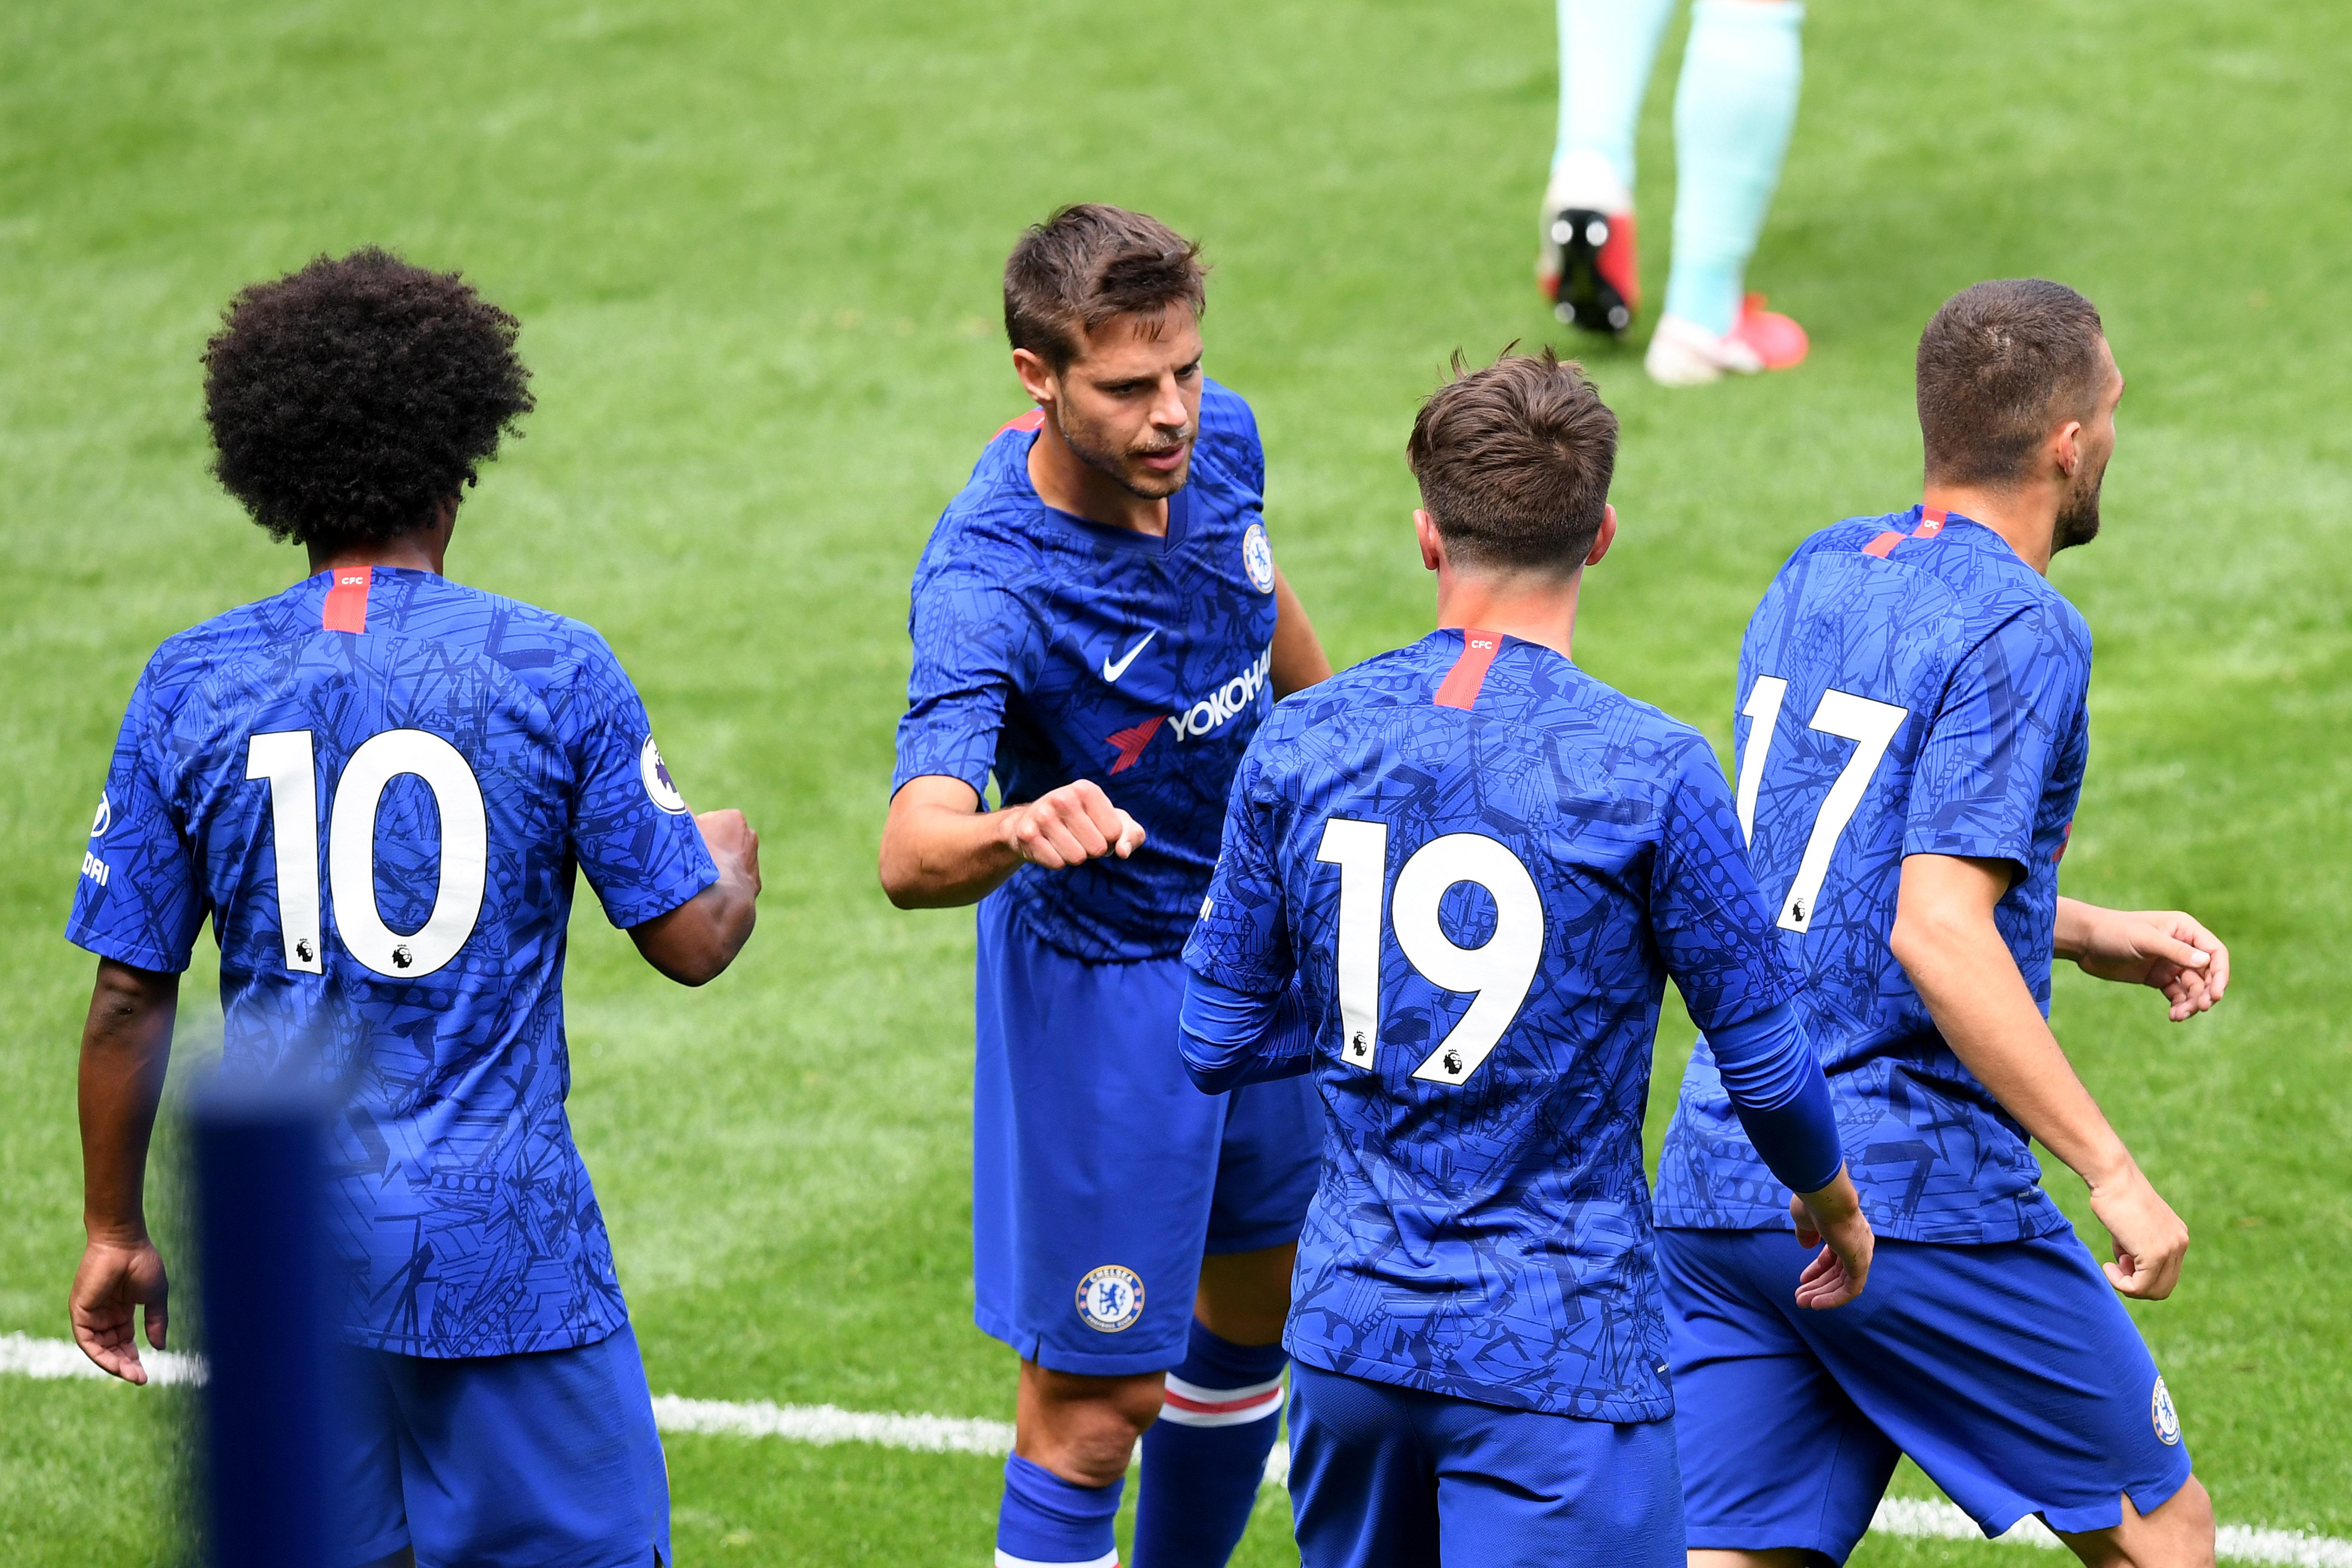 Chelsea v QPR: Friendly